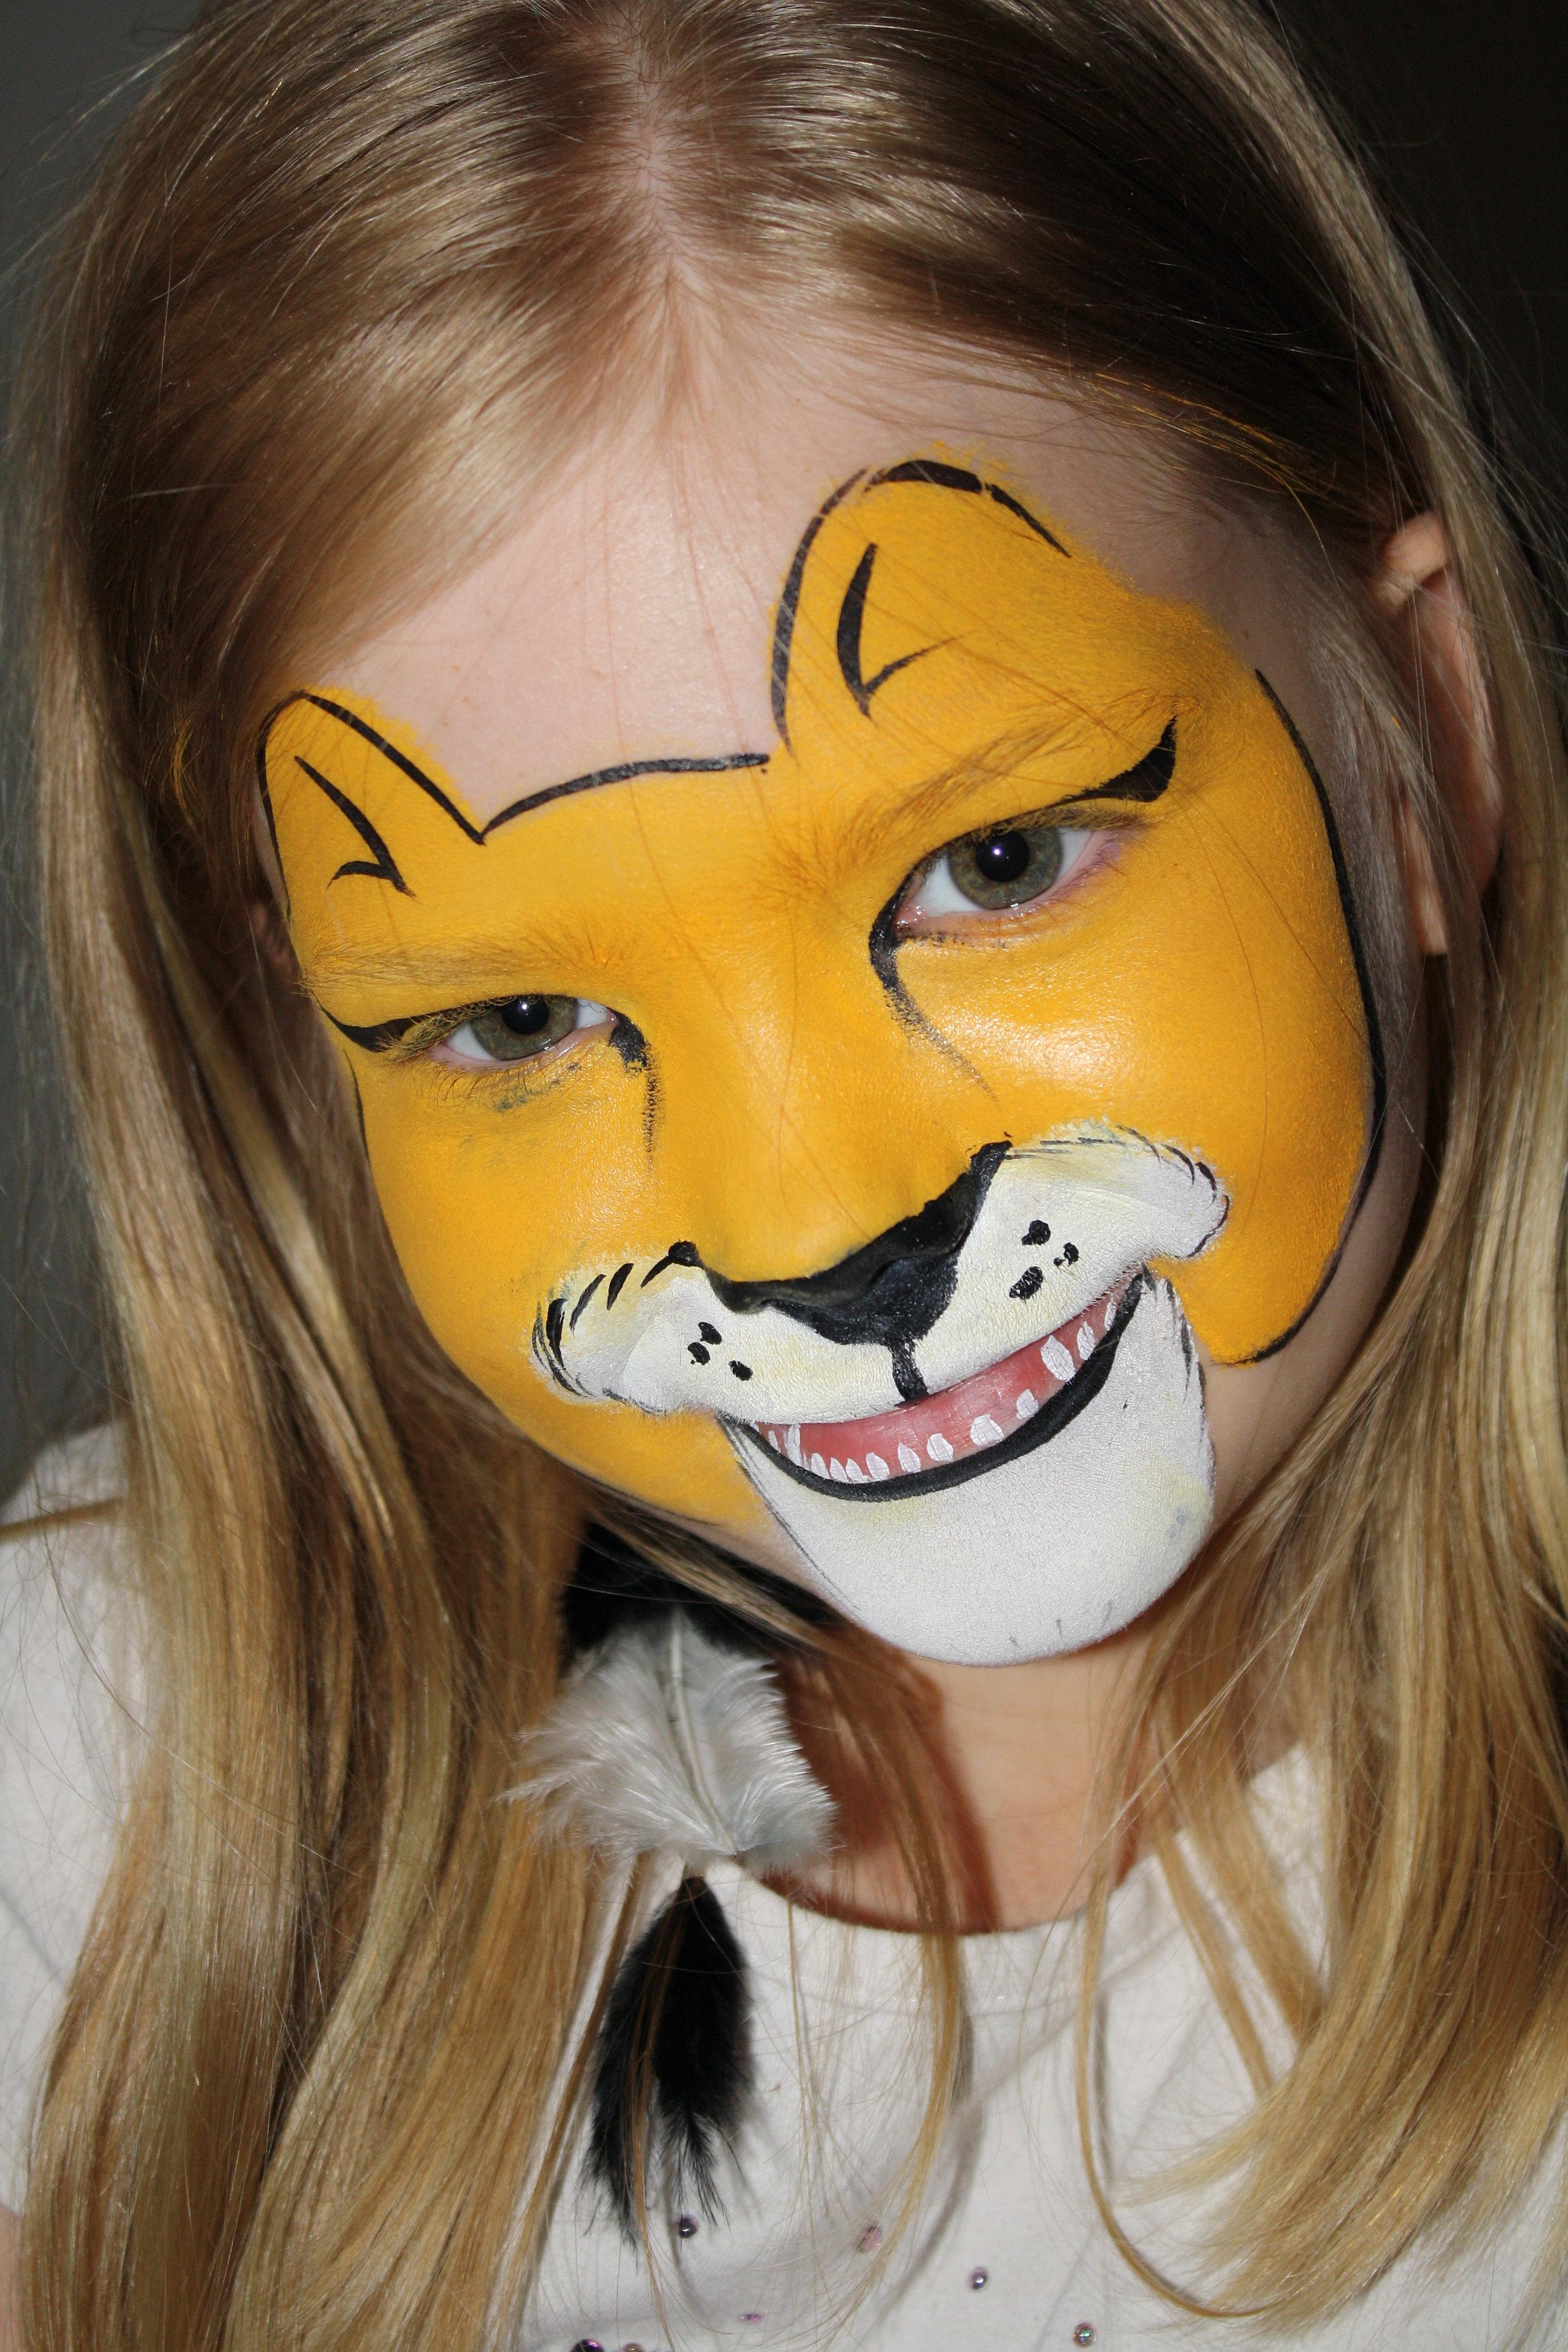 Uncategorized Lion Facepaint how to paint a lion face better life do m home video dailymotion